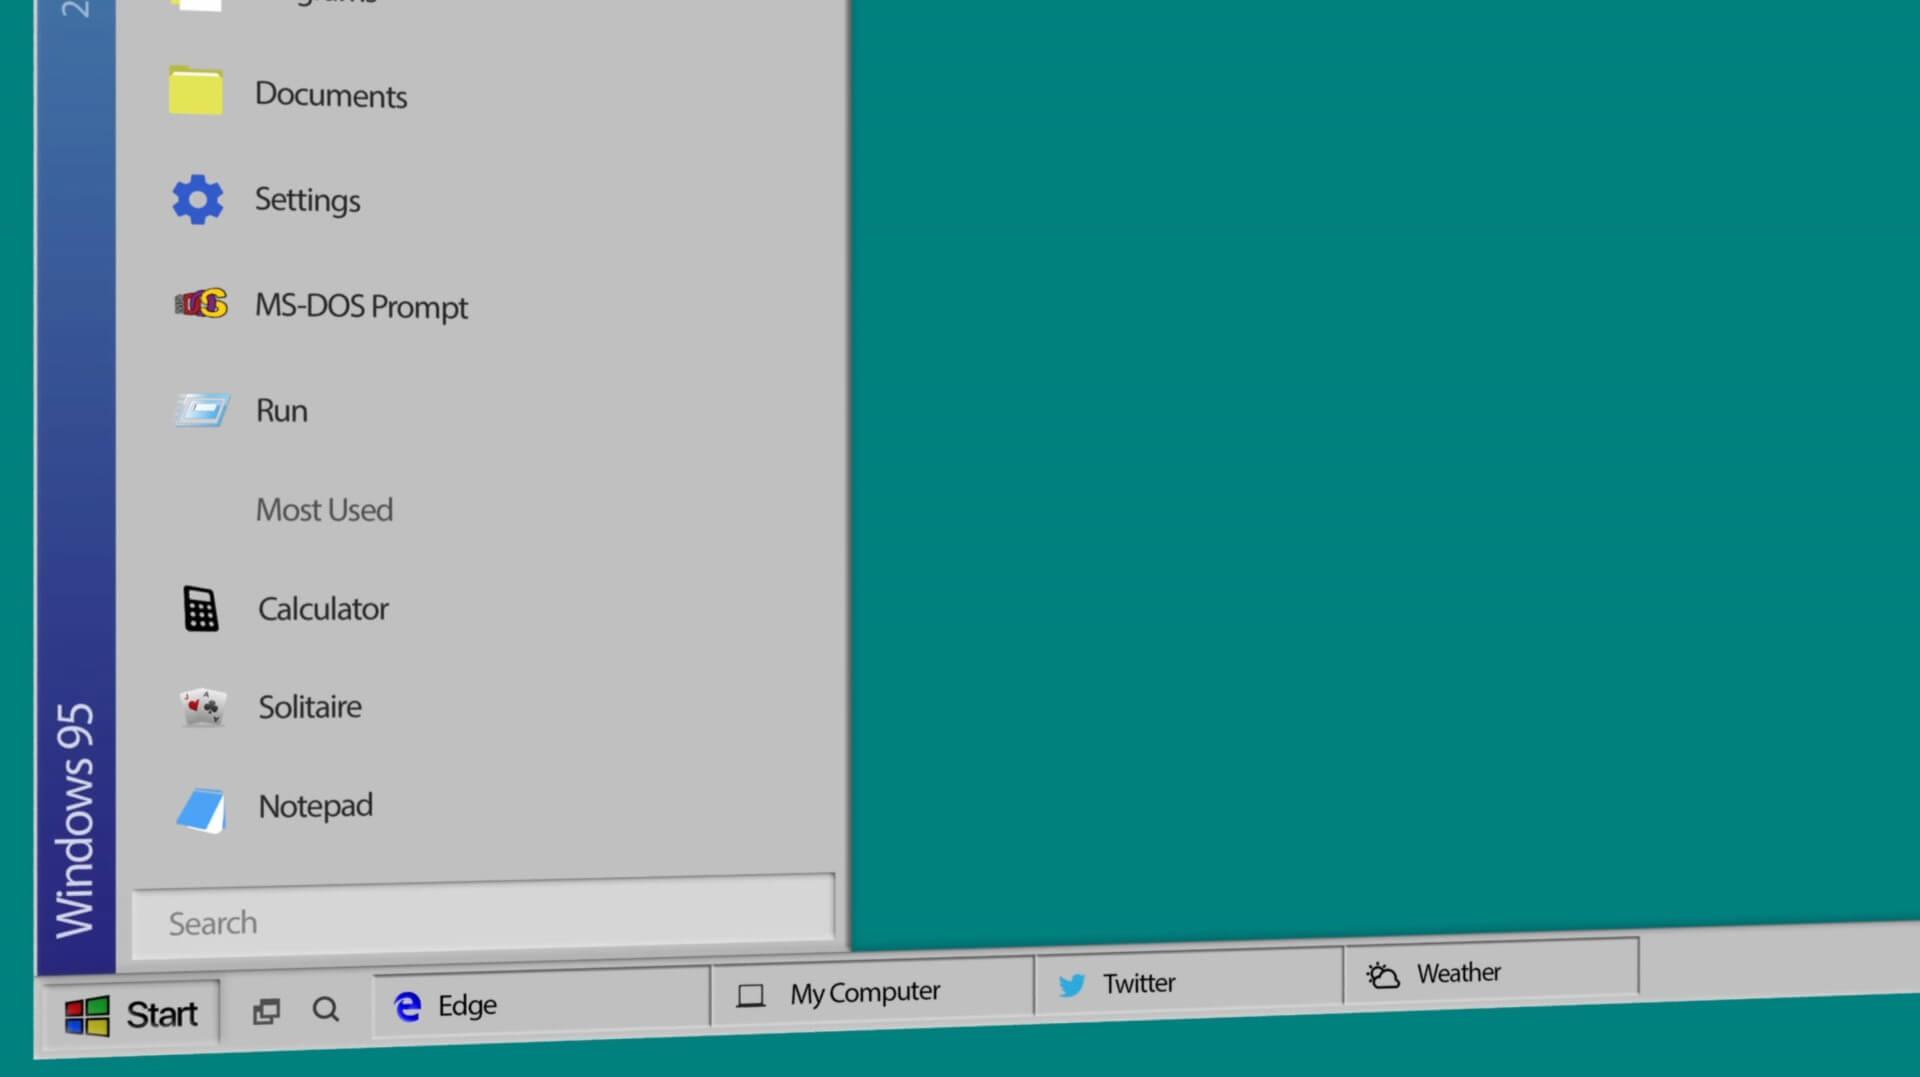 Windows 95 - 2018 Edition